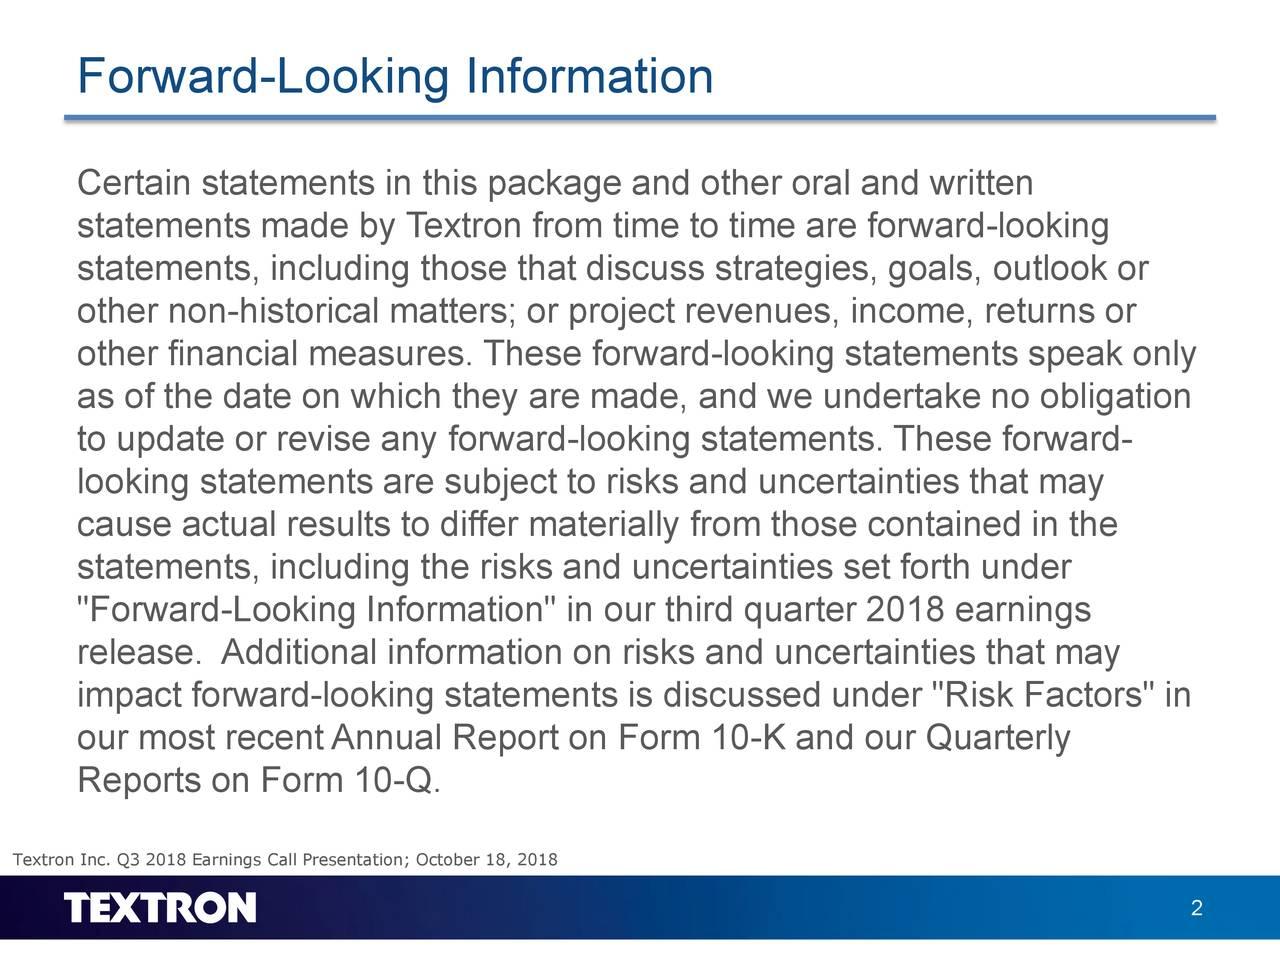 Forward-Looking Information